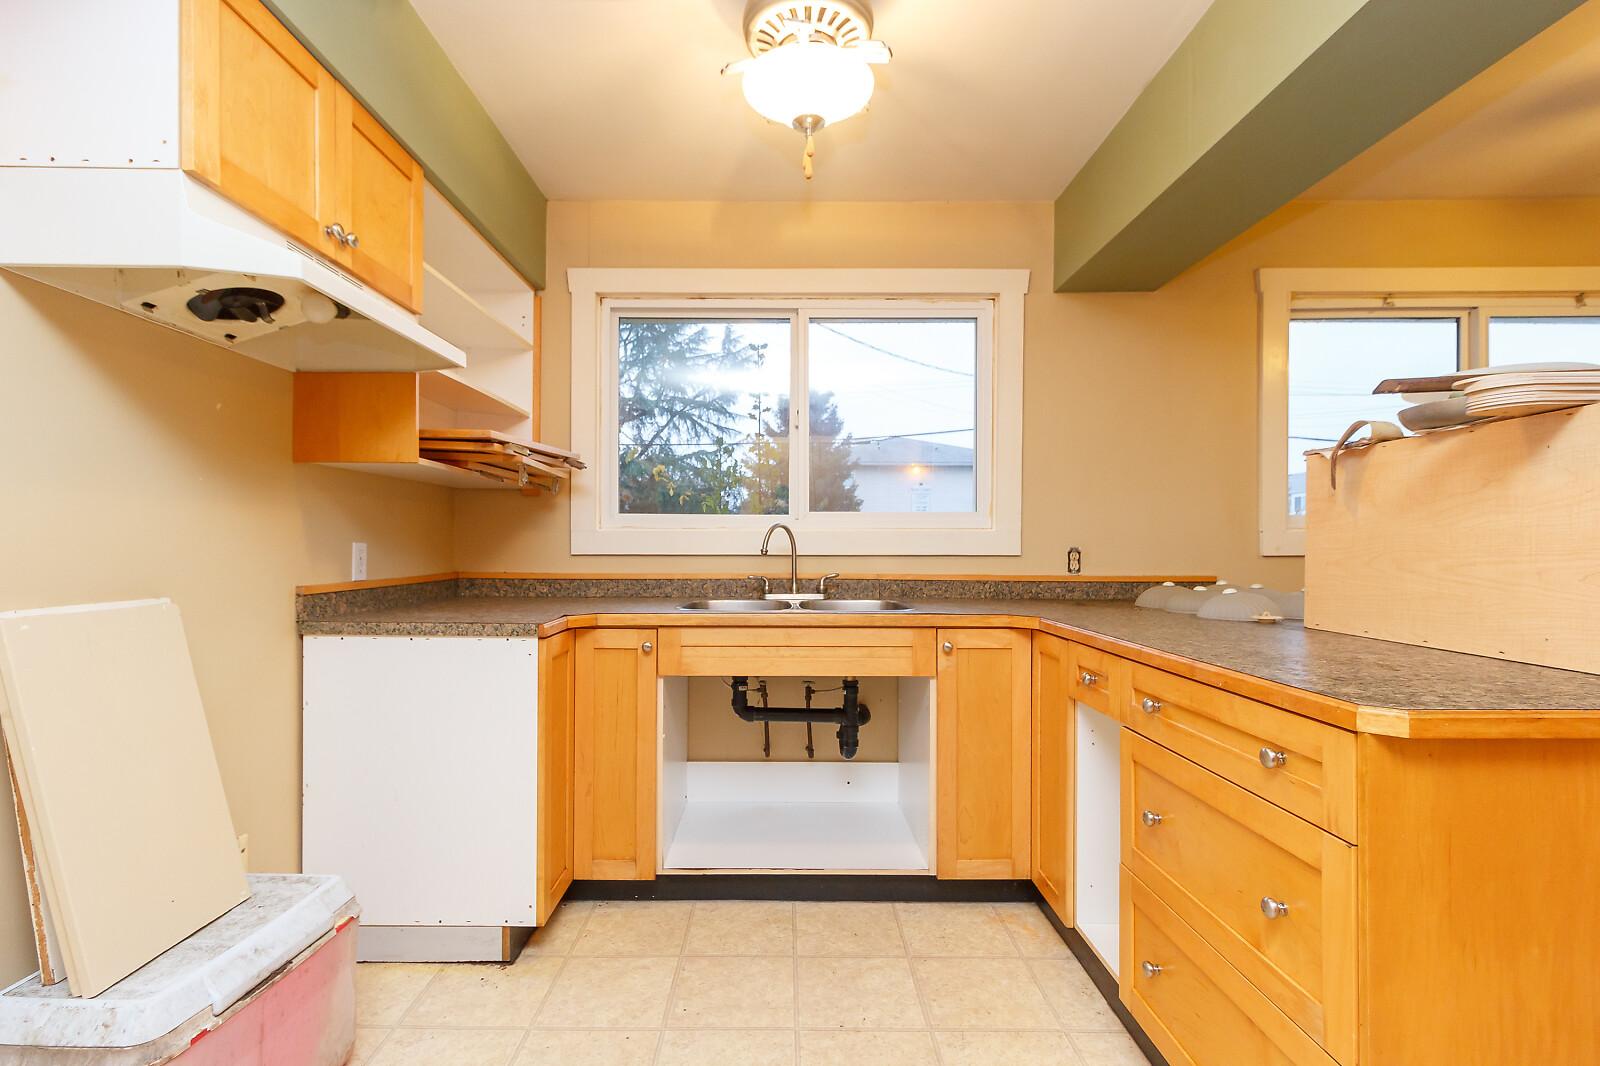 2519 Lewis St, Duncan, British Columbia  V9L 2Z2 - Photo 11 - 861929